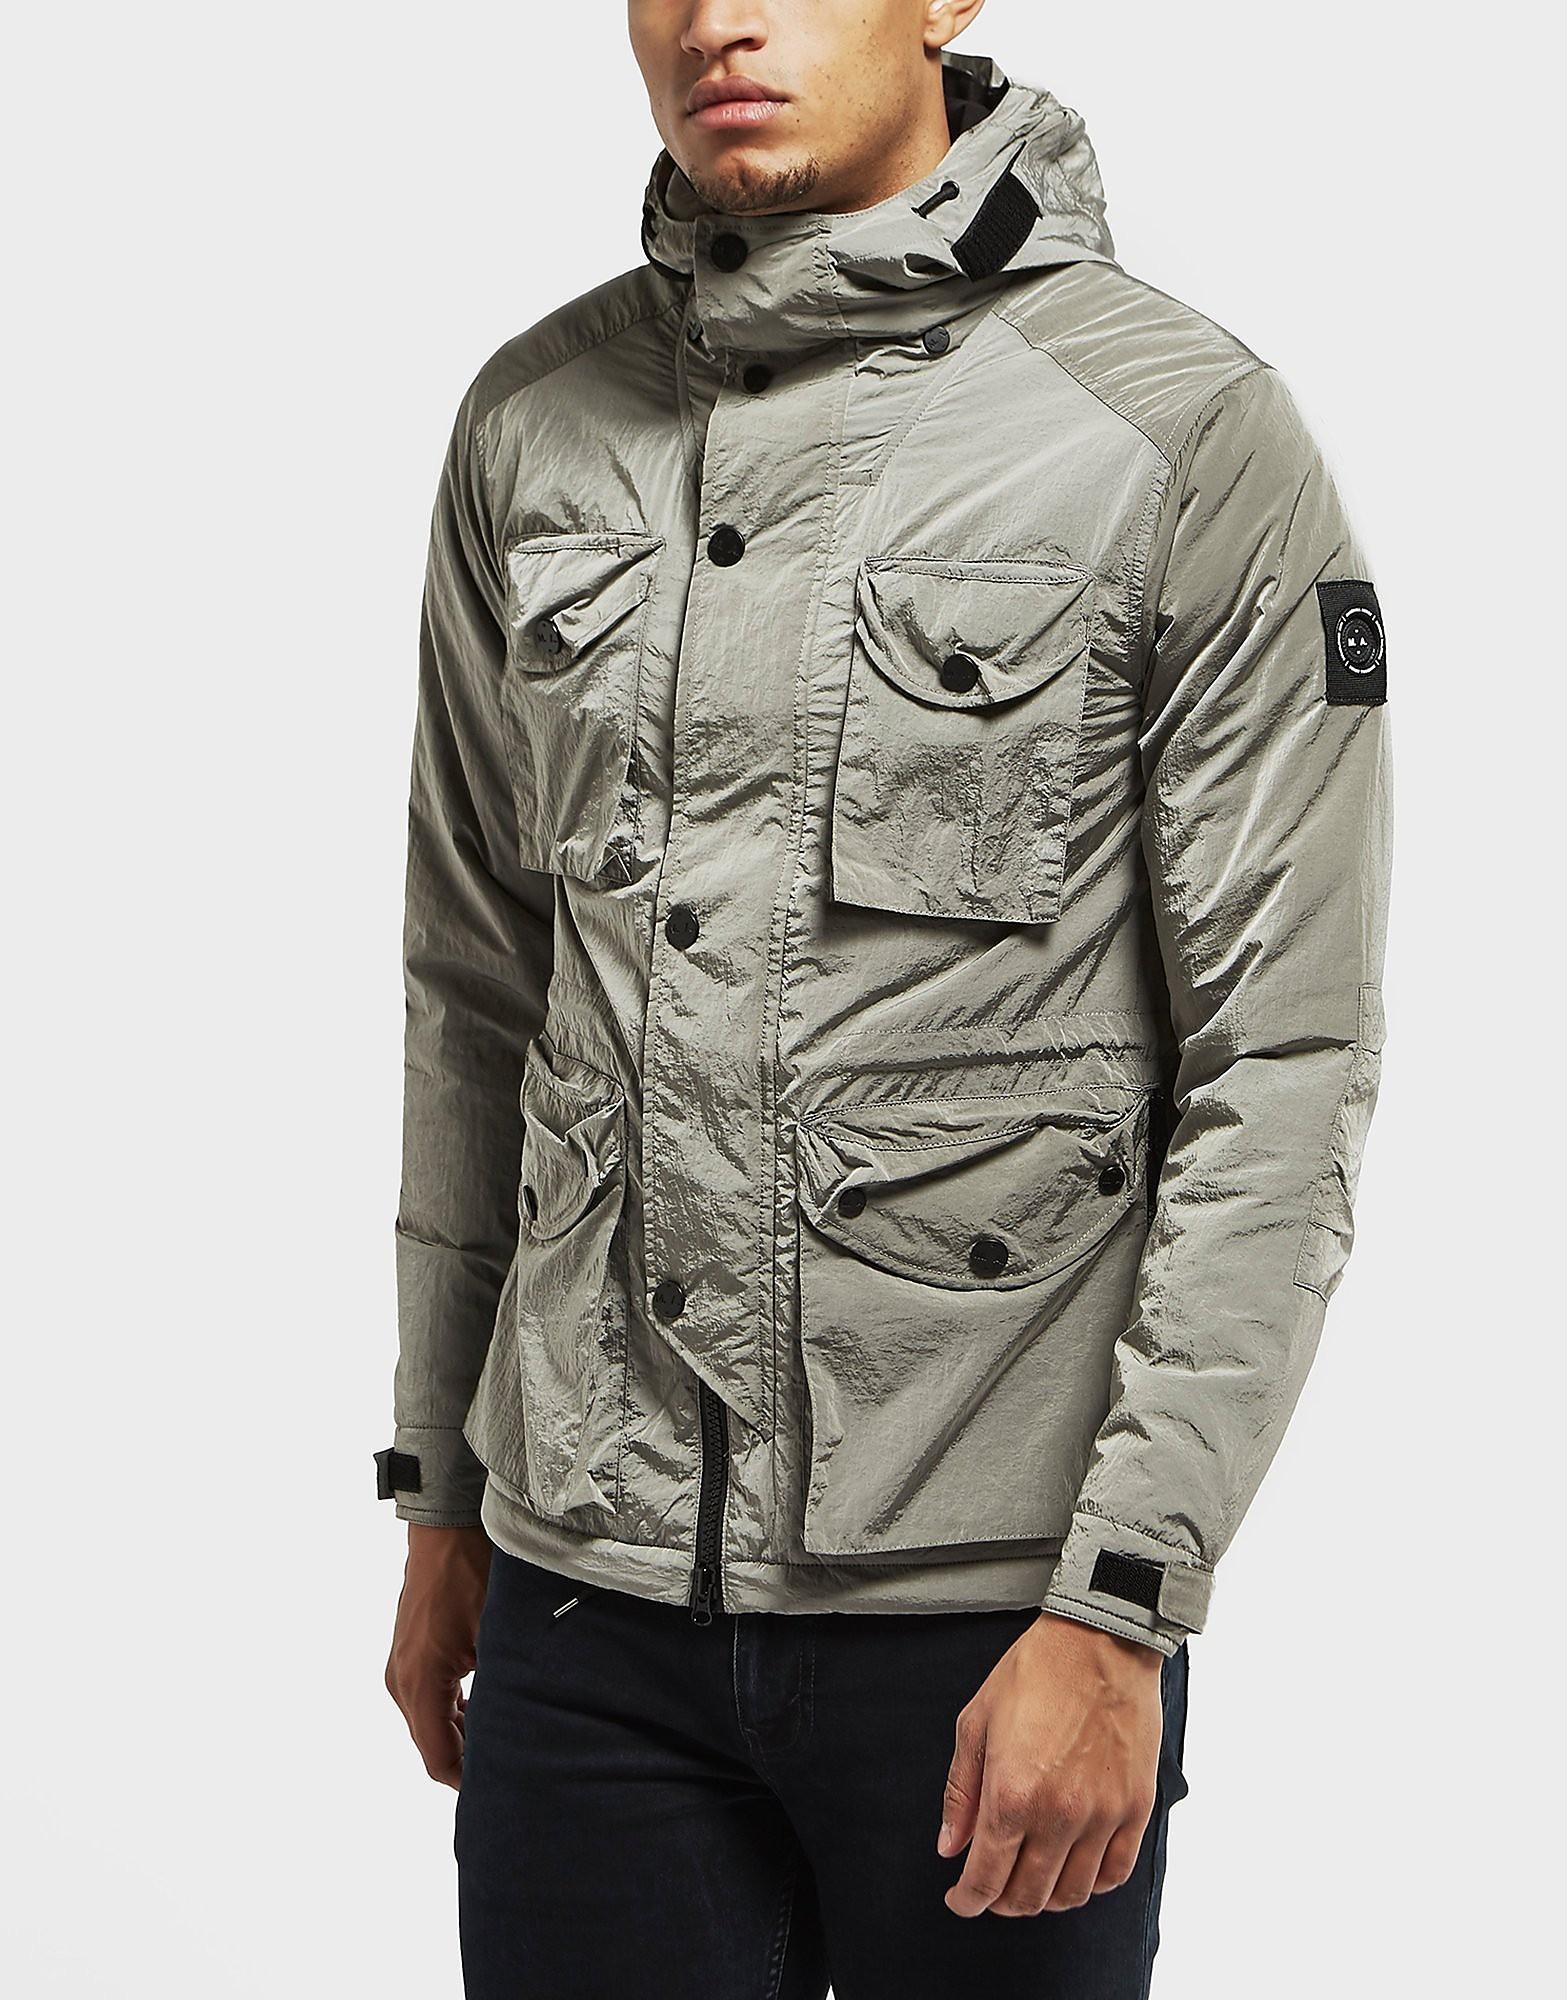 Marshall Artist Nylon Parka Jacket